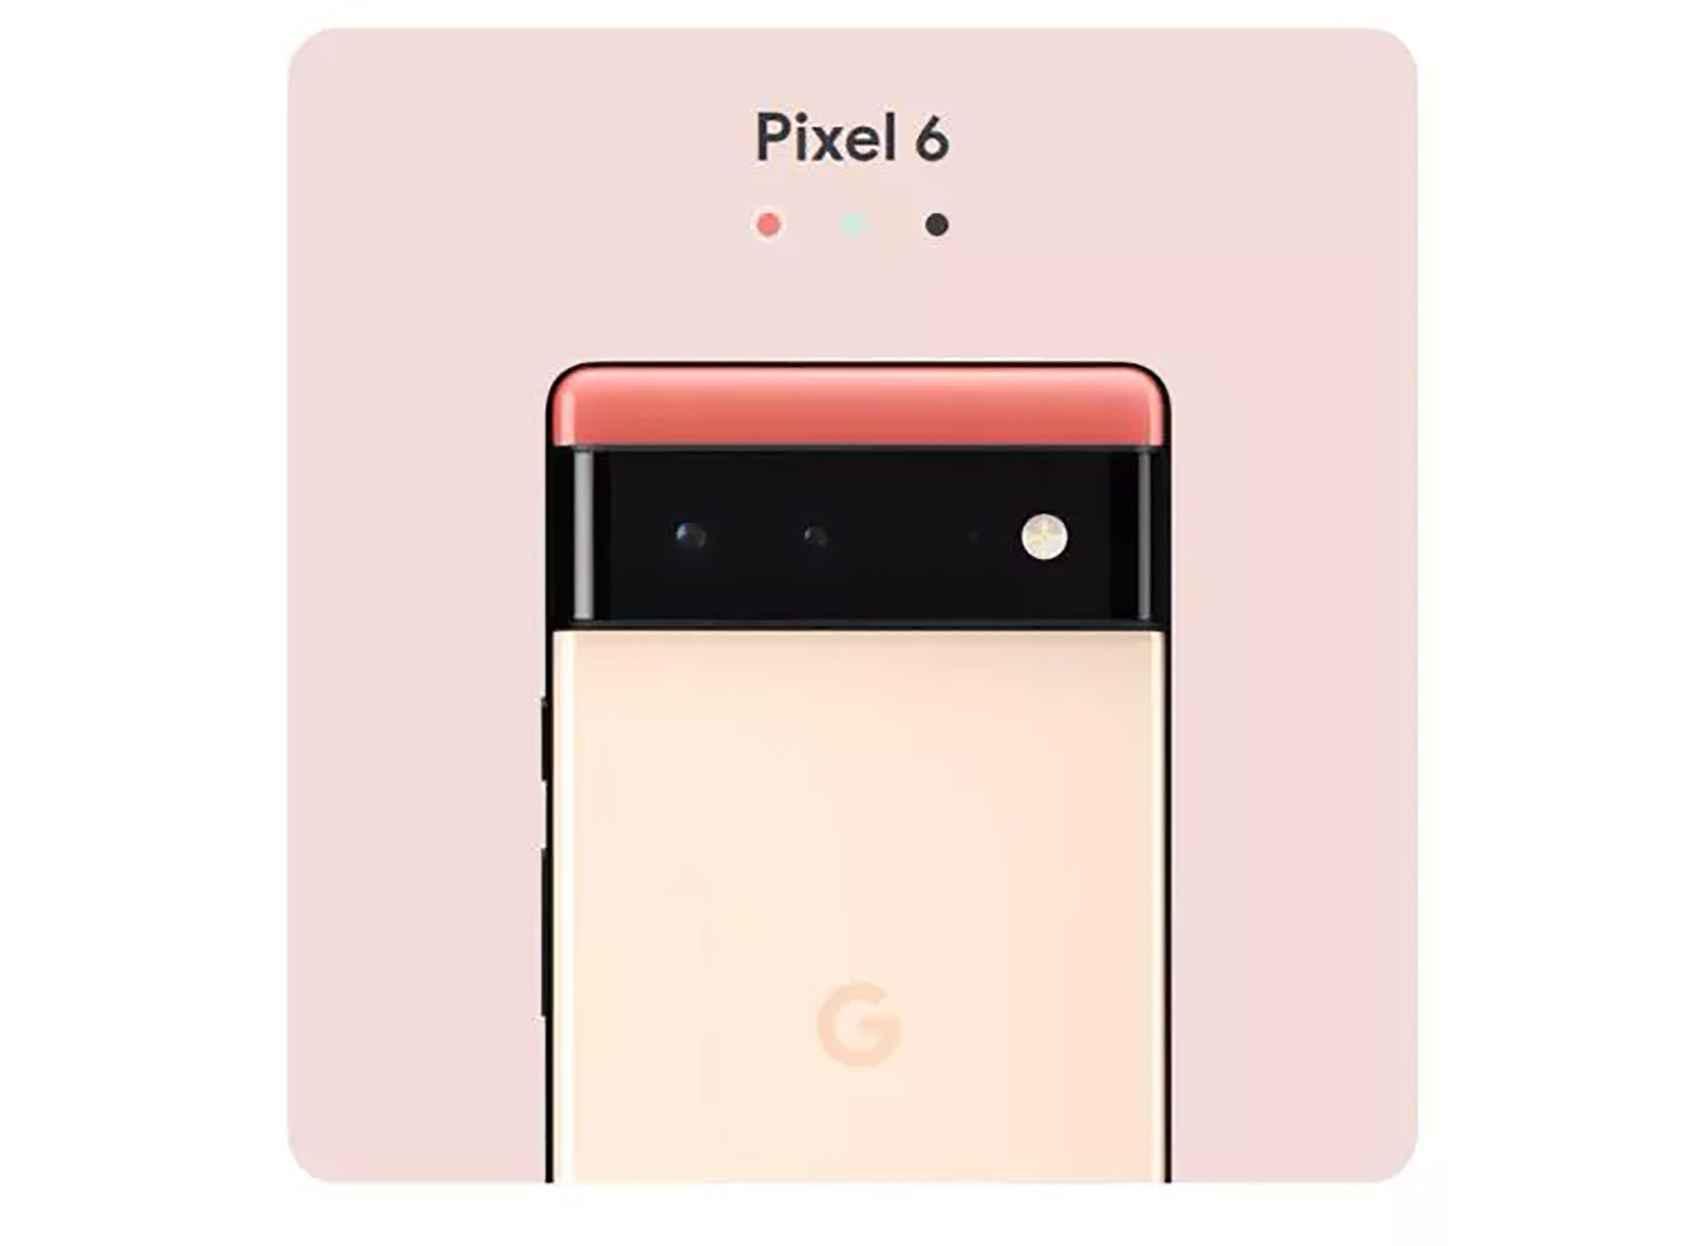 El Google Pixel 6 así se ve en la landing page